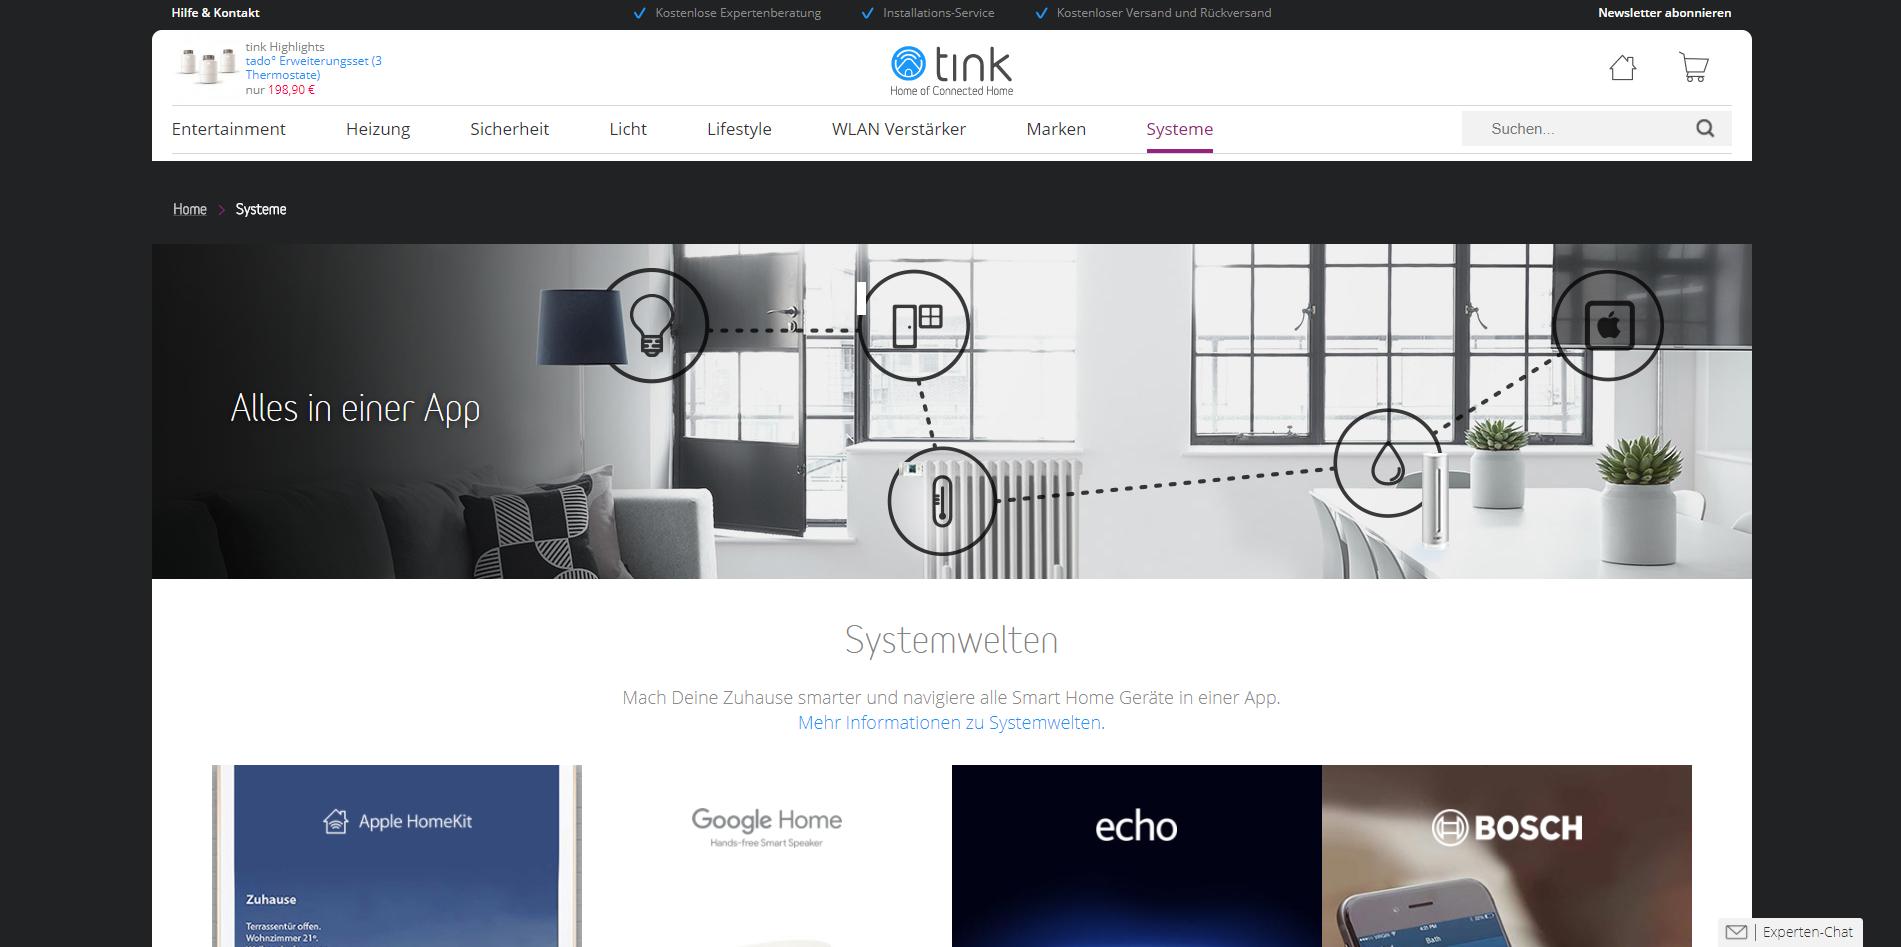 alternativen zu tink smart home die besten tink smart. Black Bedroom Furniture Sets. Home Design Ideas